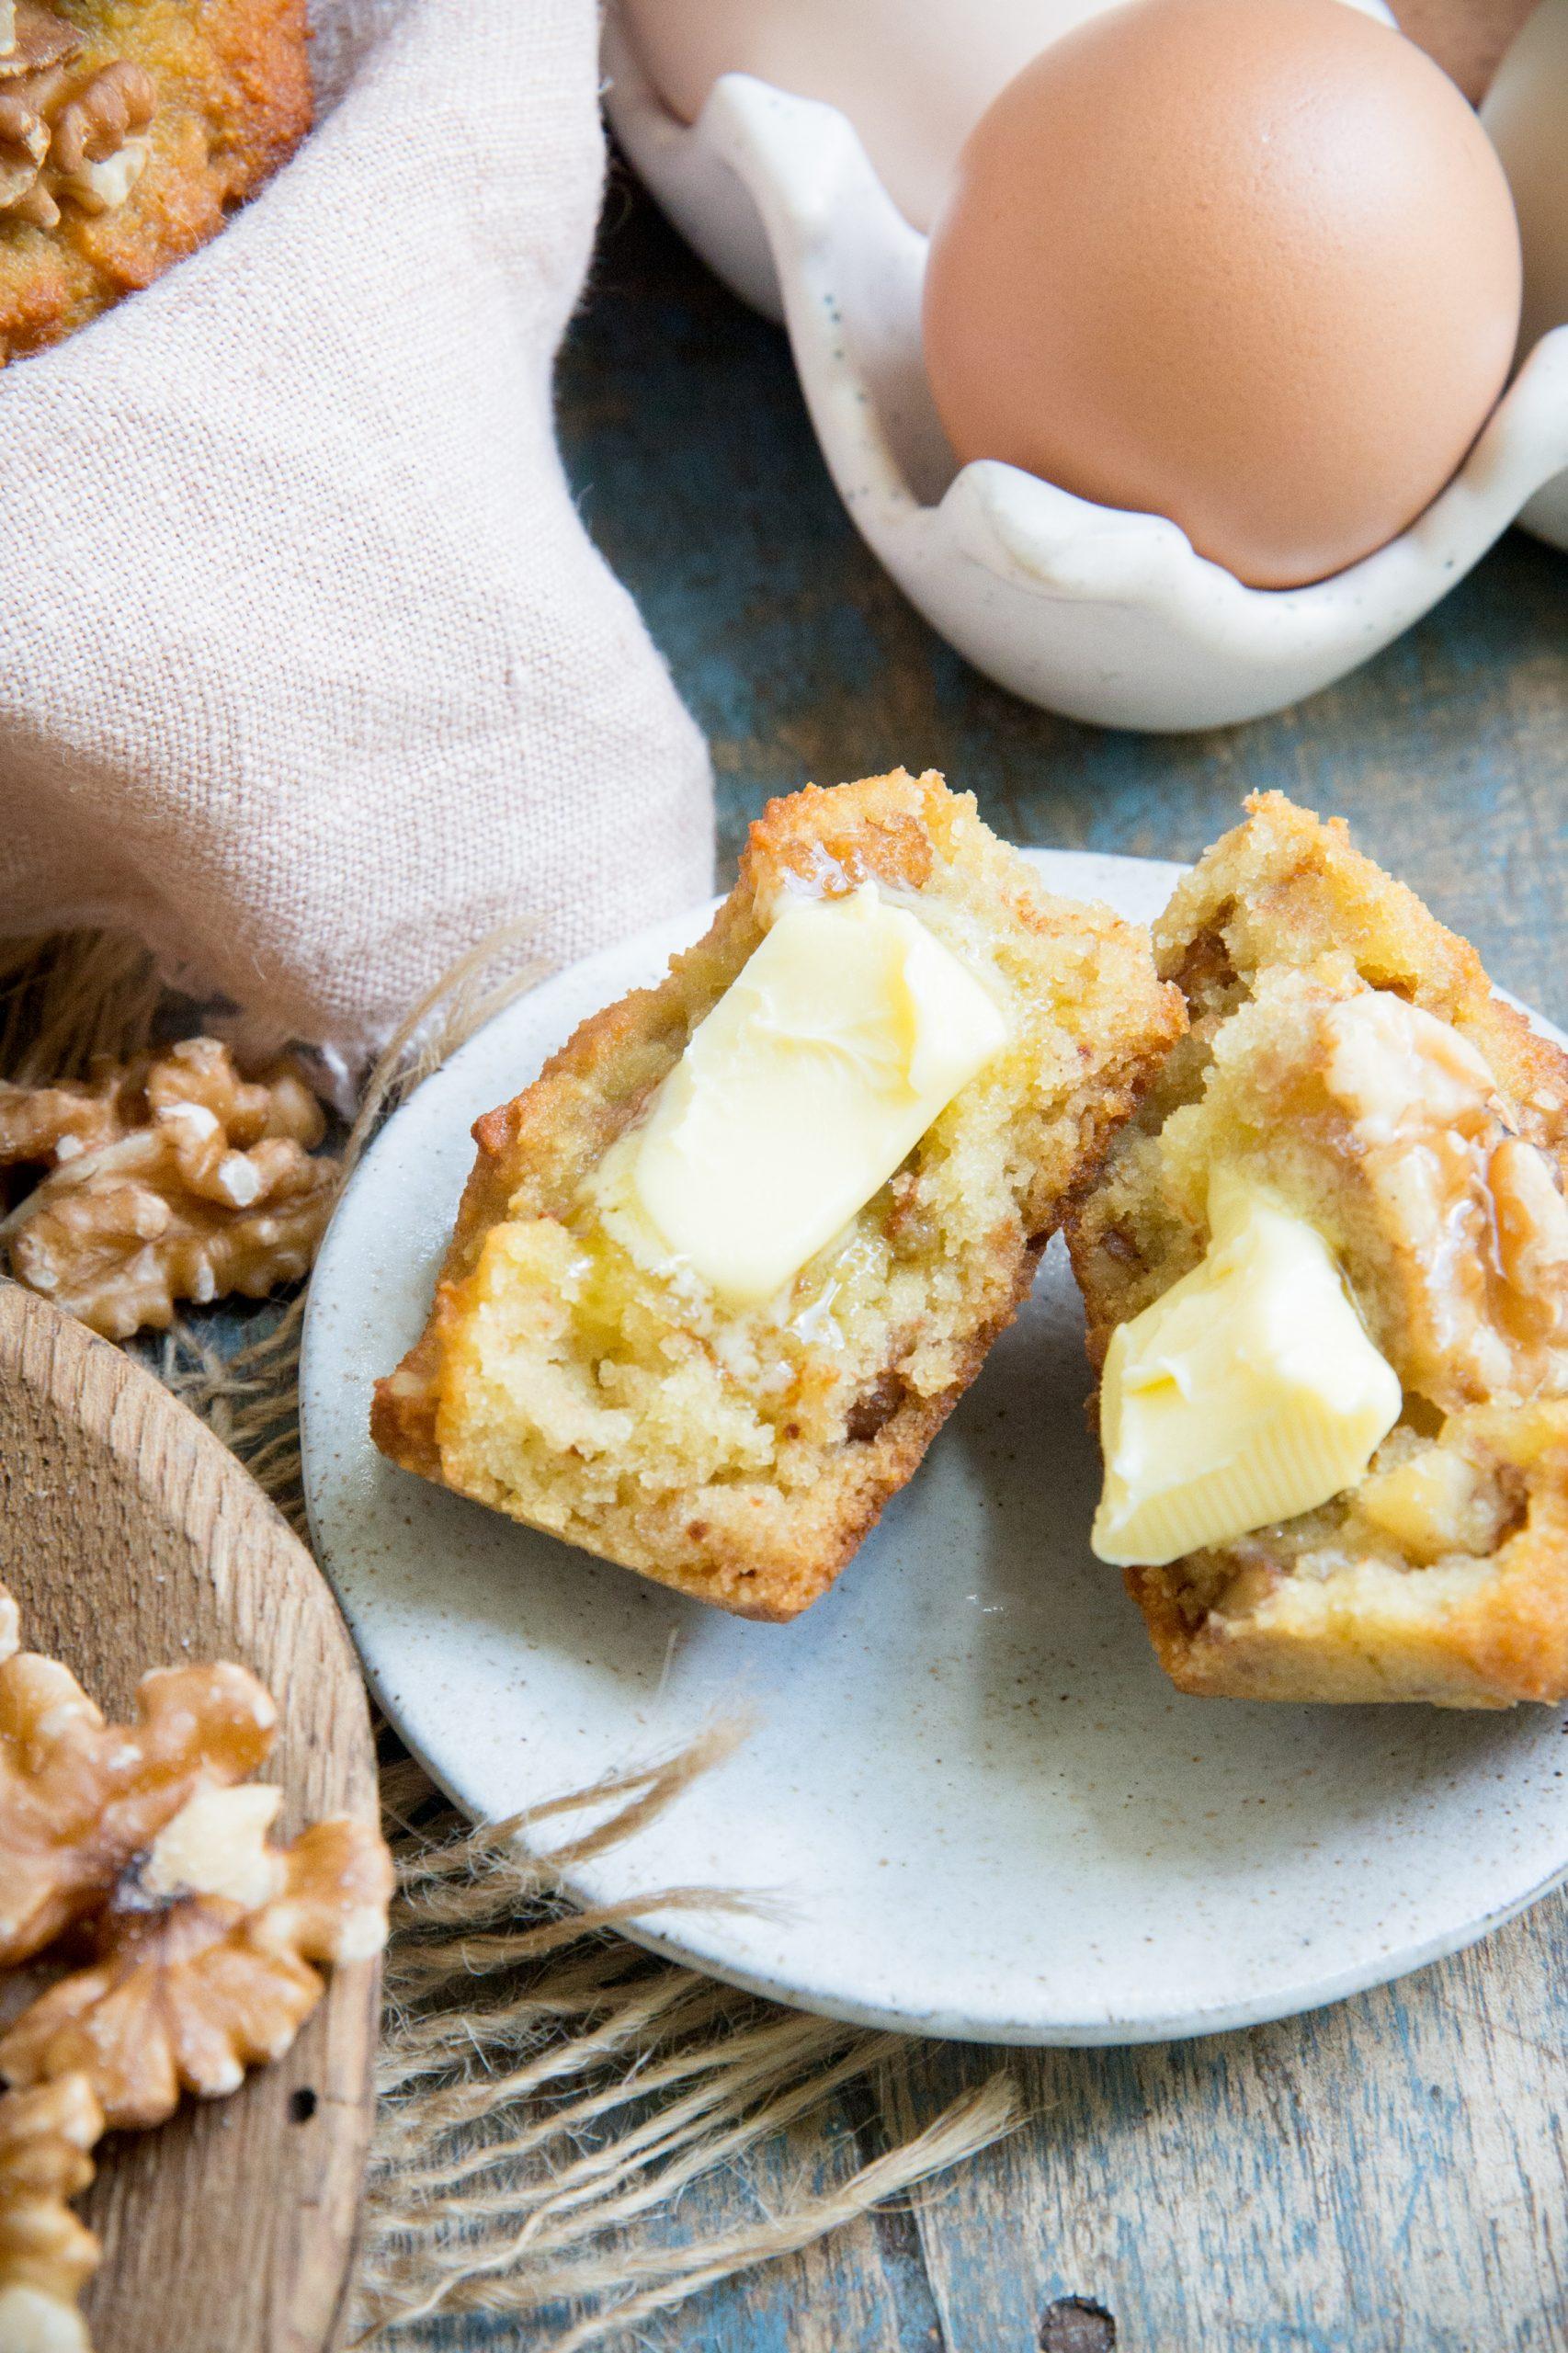 Melting Butter on the keto banana nut muffins.